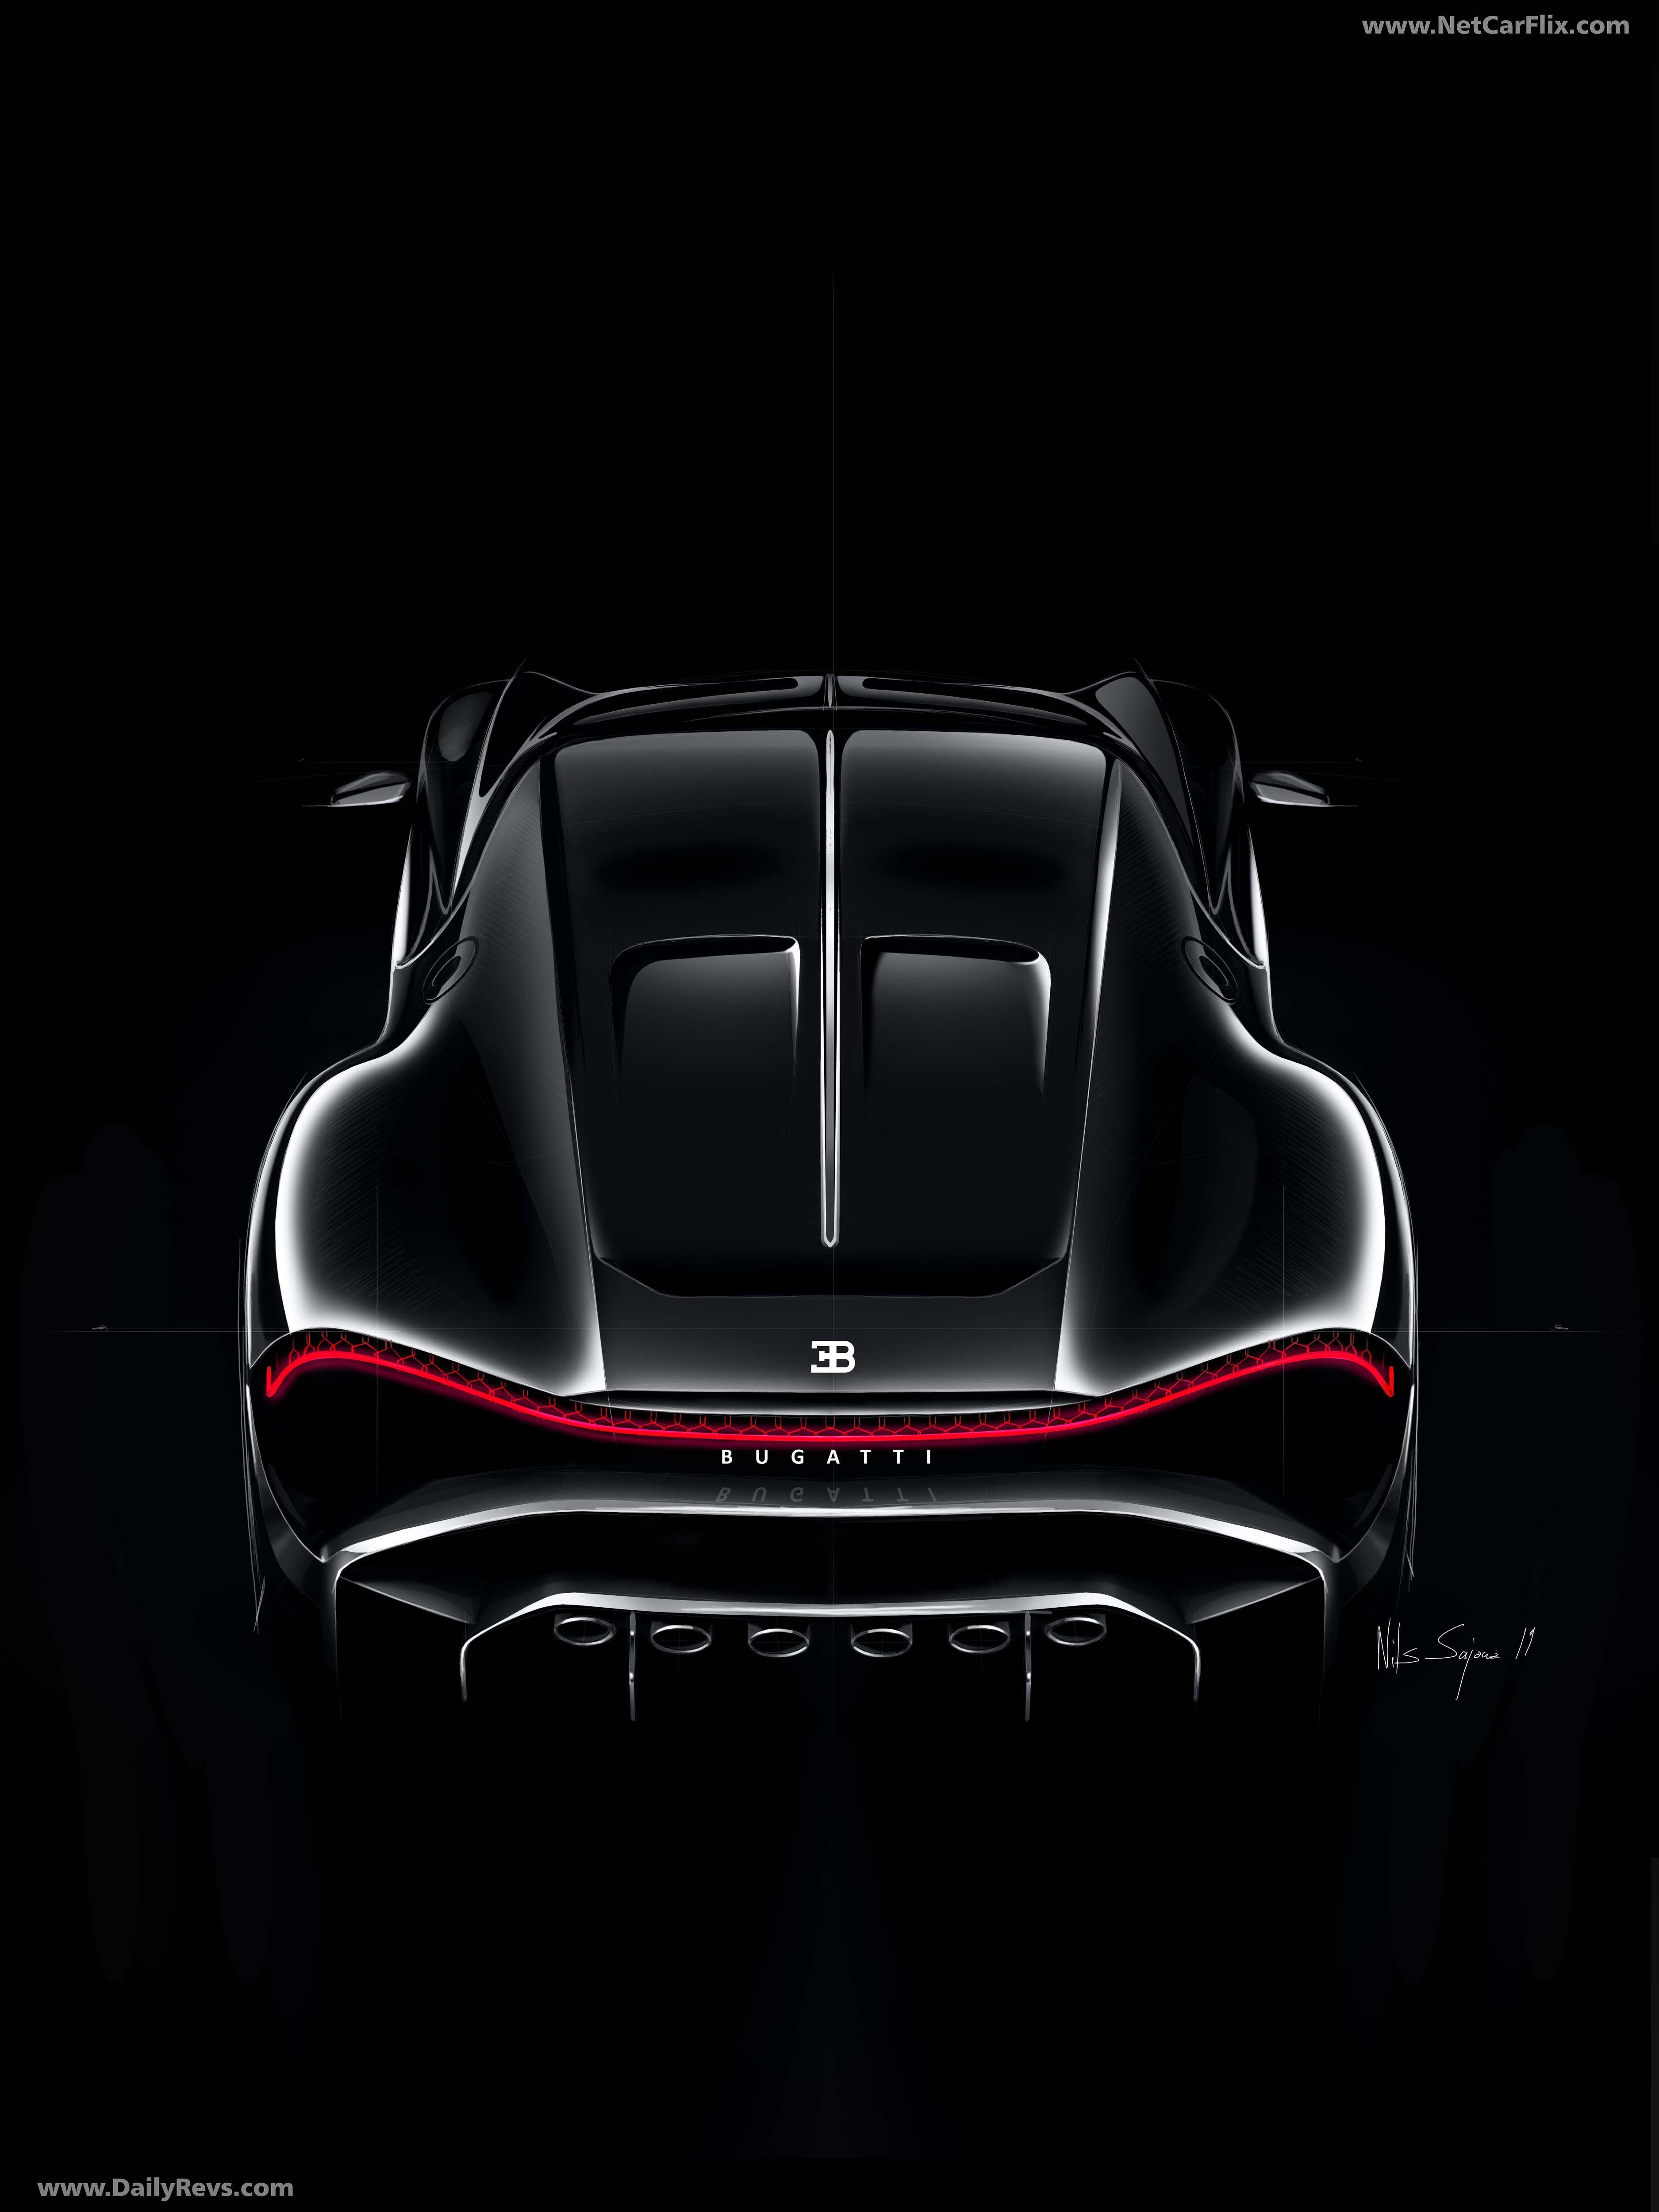 2019 Bugatti La Voiture Noire Hd Pictures Videos Specs Information Dailyrevs Bugatti Black Car Best Luxury Cars